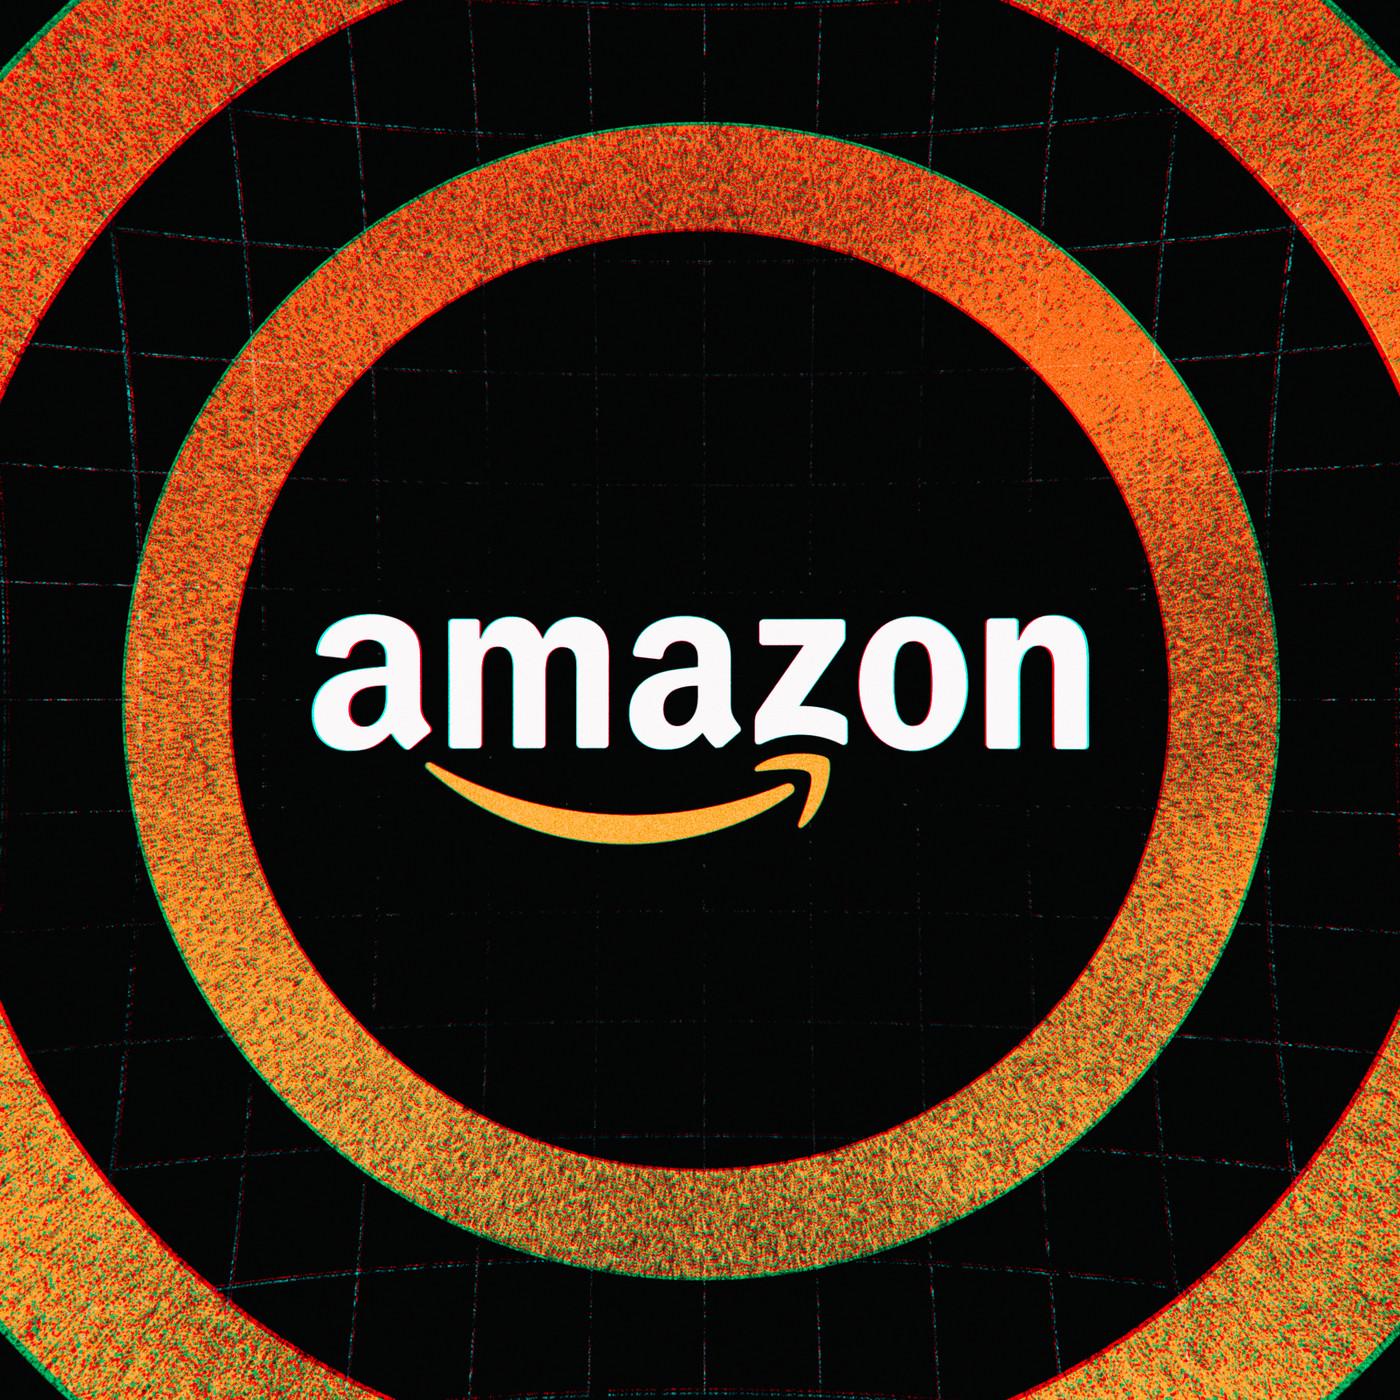 Amazon Wants To Hire 100000 New Workers To Meet Coronavirus